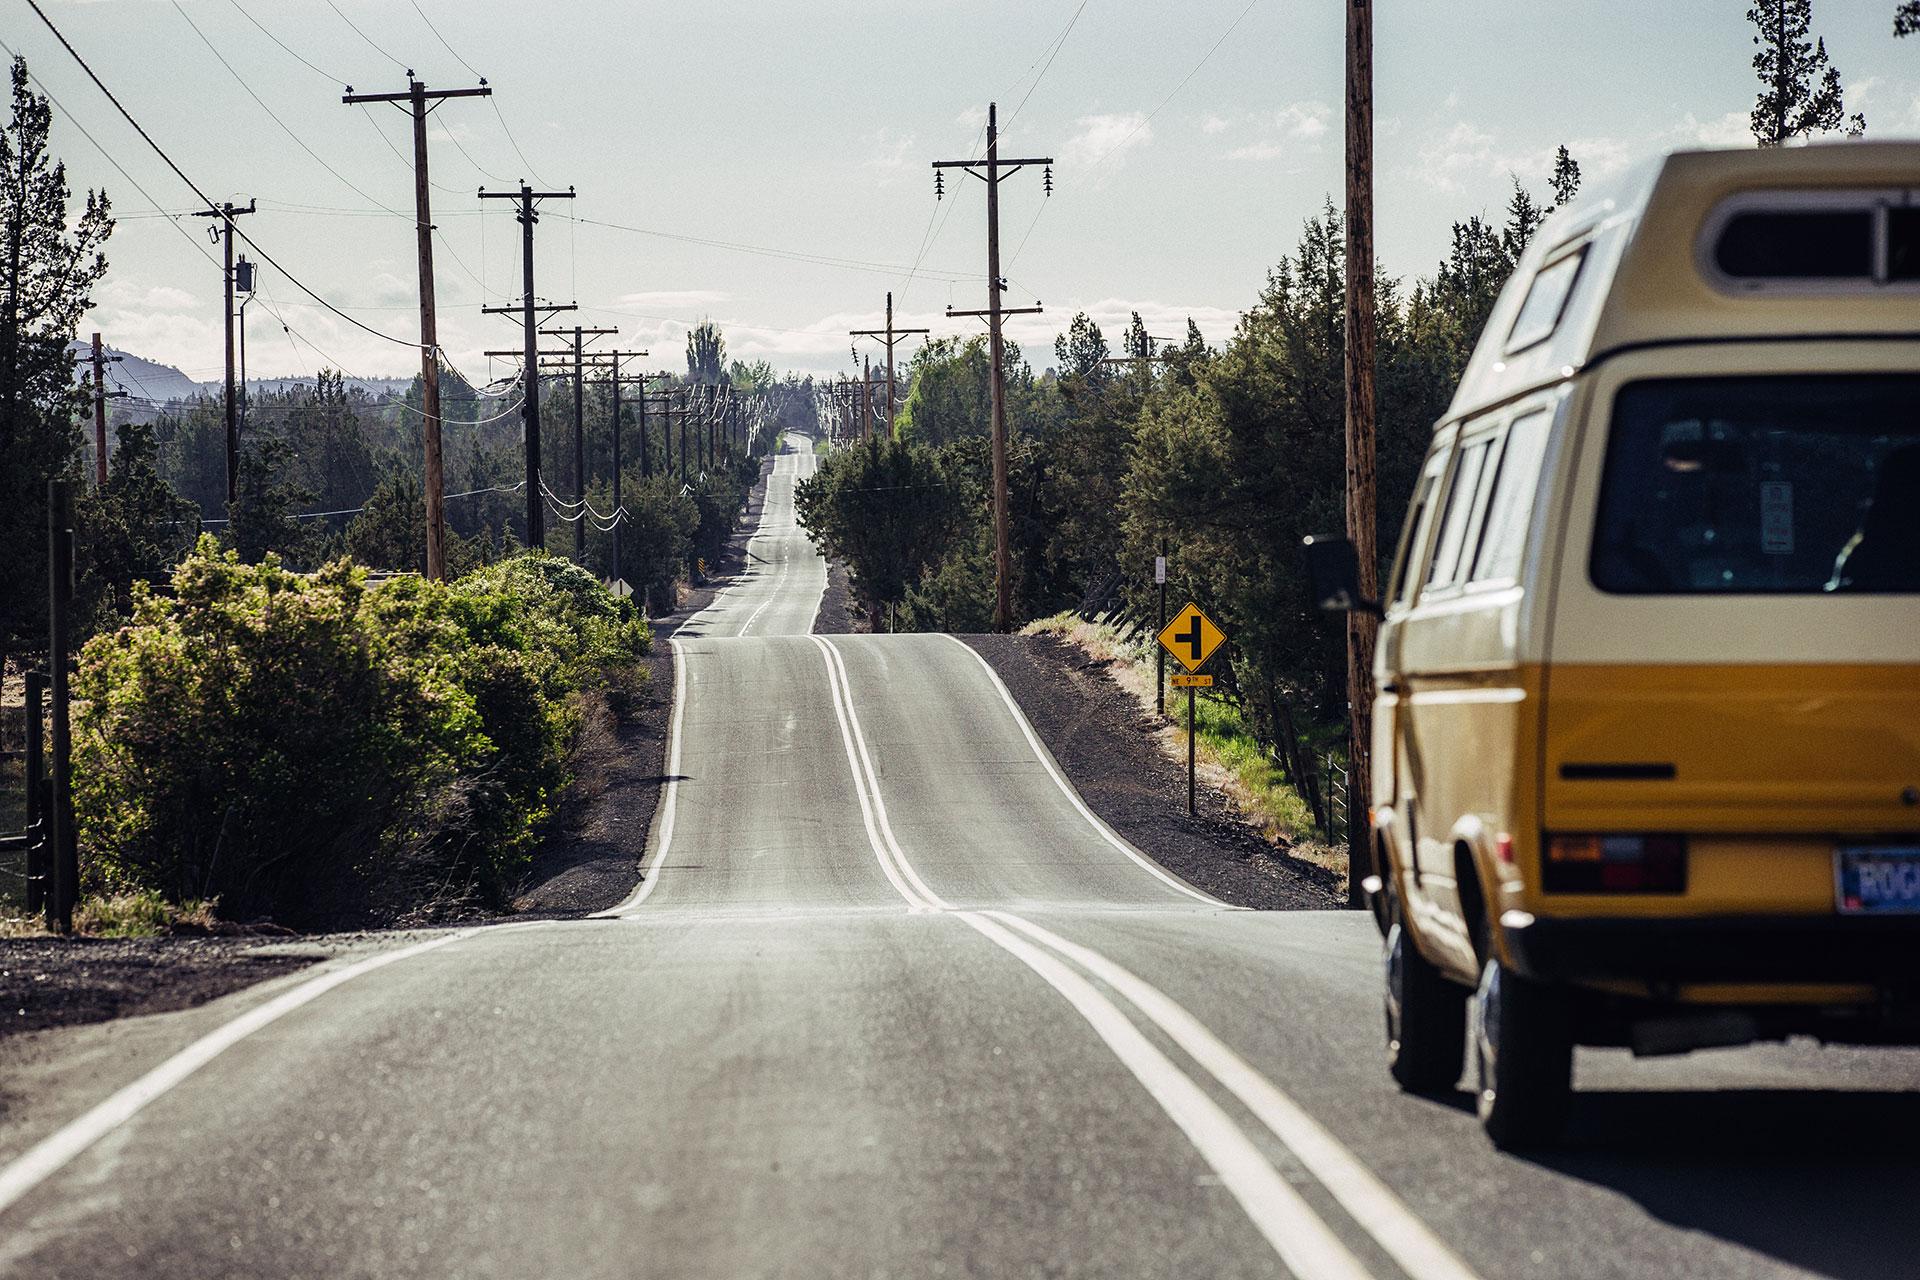 vanlife fotograf roadtrip road oregon vw bus zuerich schweiz